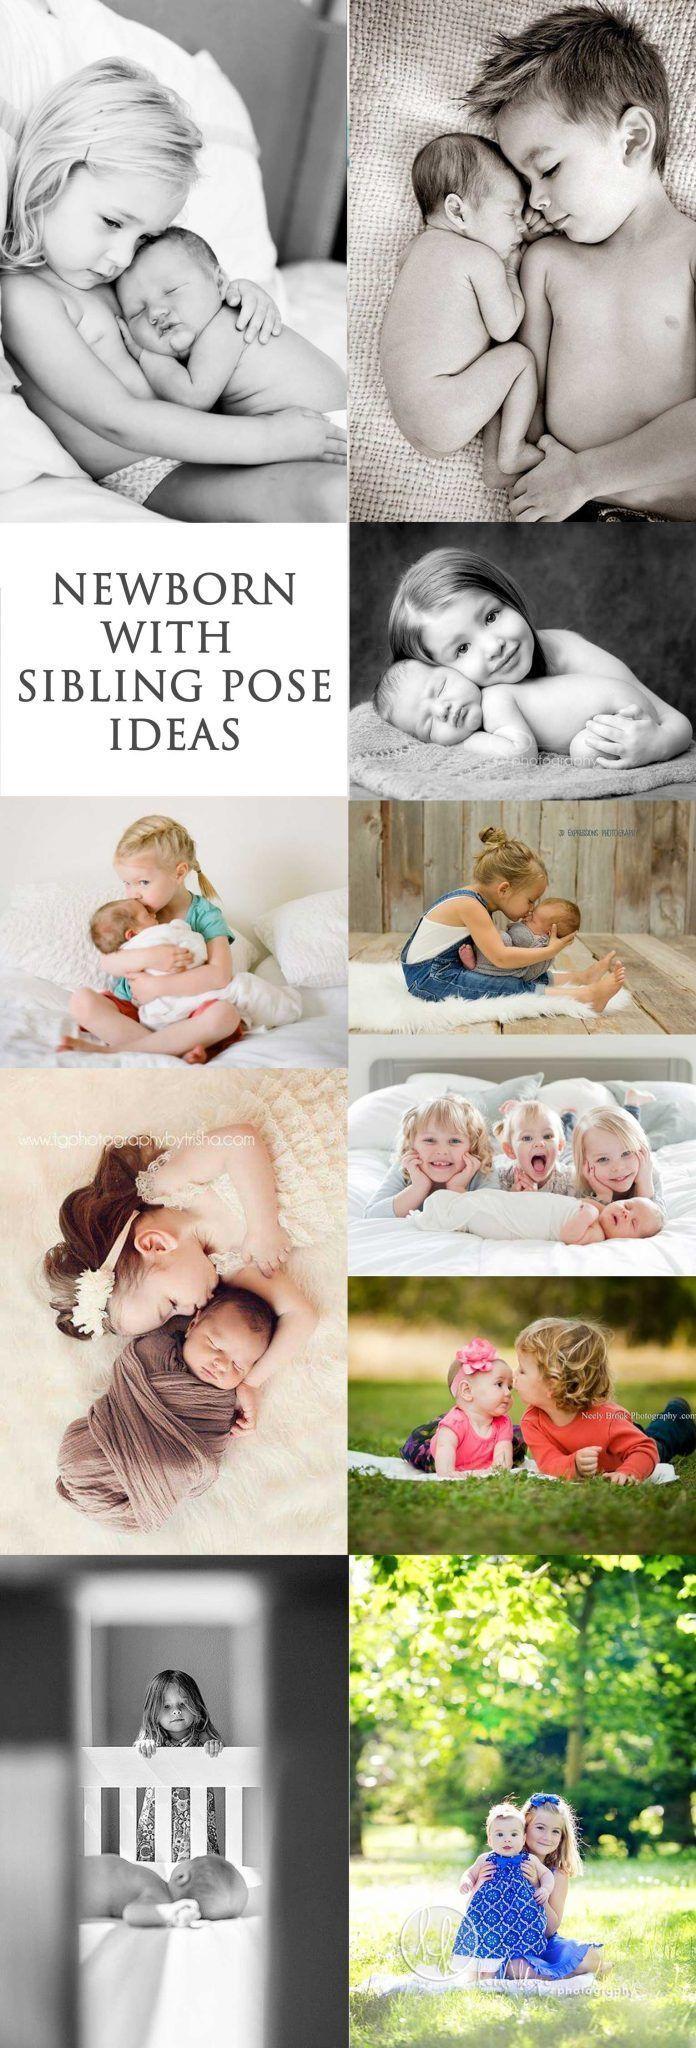 2019 Trend der Neugeborenenfotografie Ideen & Tipp…